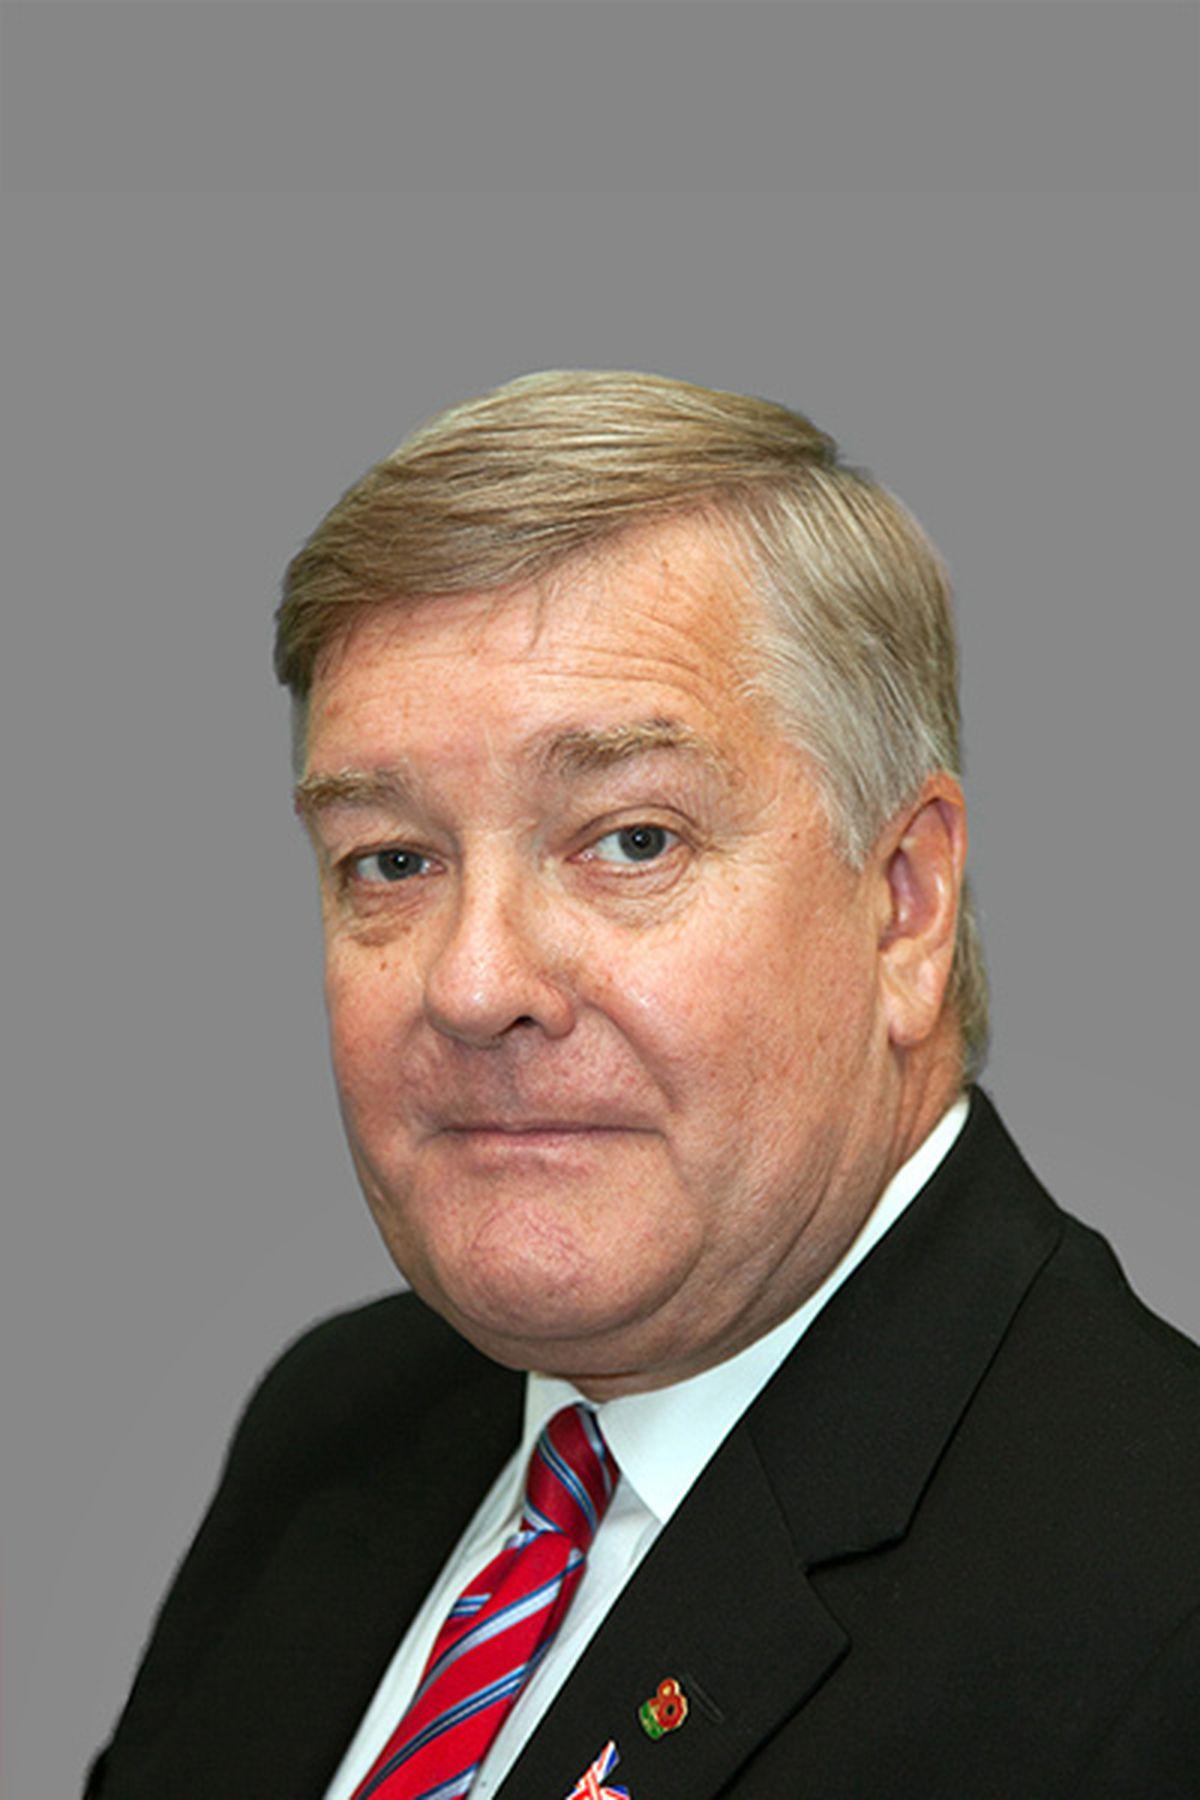 Councillor Ian Jones